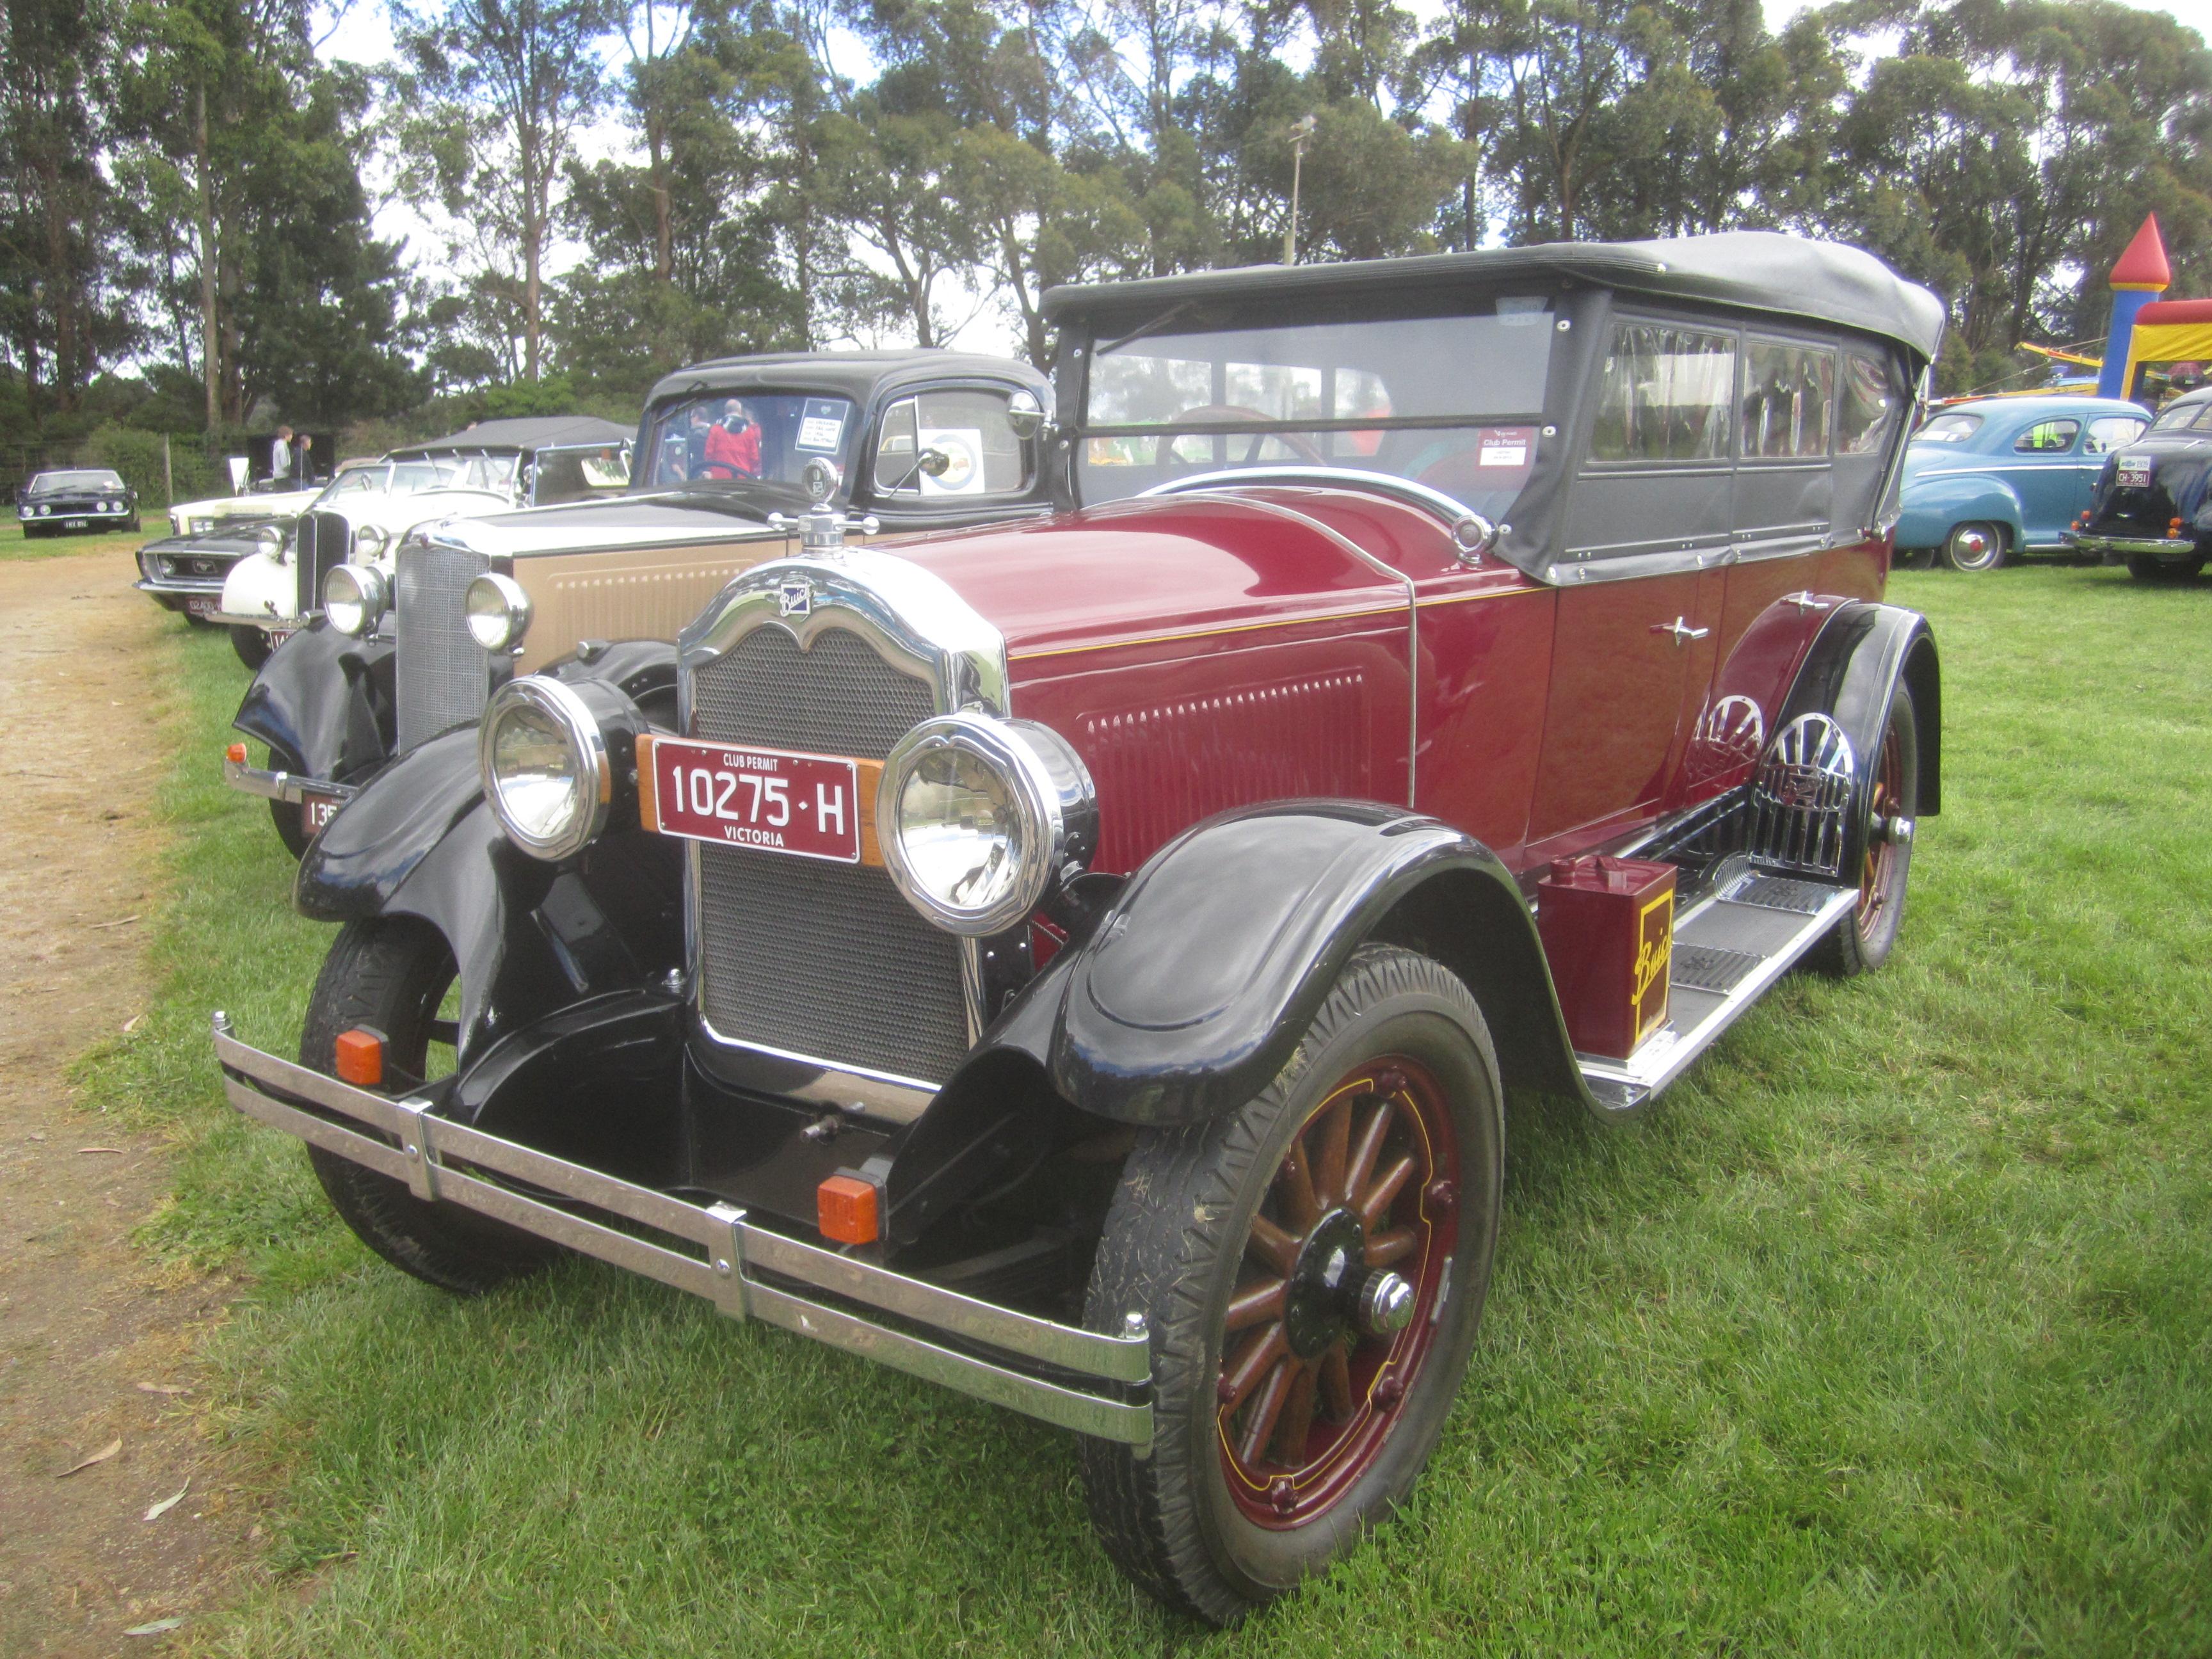 Sport Cars For Sale >> File:1927 Buick Master Six Tourer.jpg - Wikimedia Commons